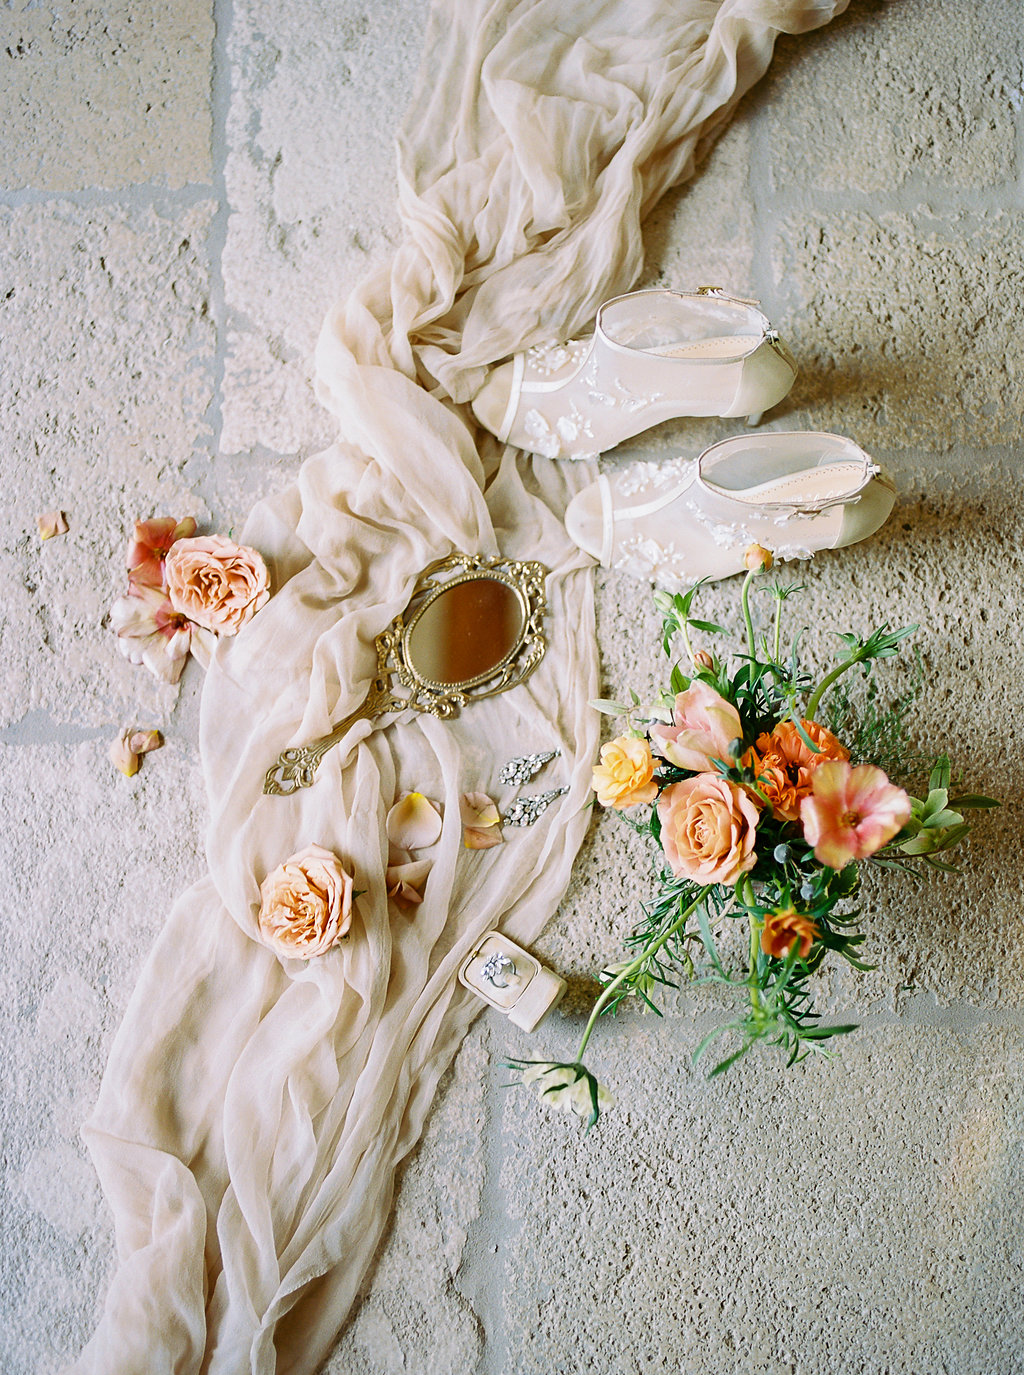 Paso Robles California - Allegretto Resort and Vineyards - Bridal Session - fine art film photographer Tanja Kibogo18.JPG